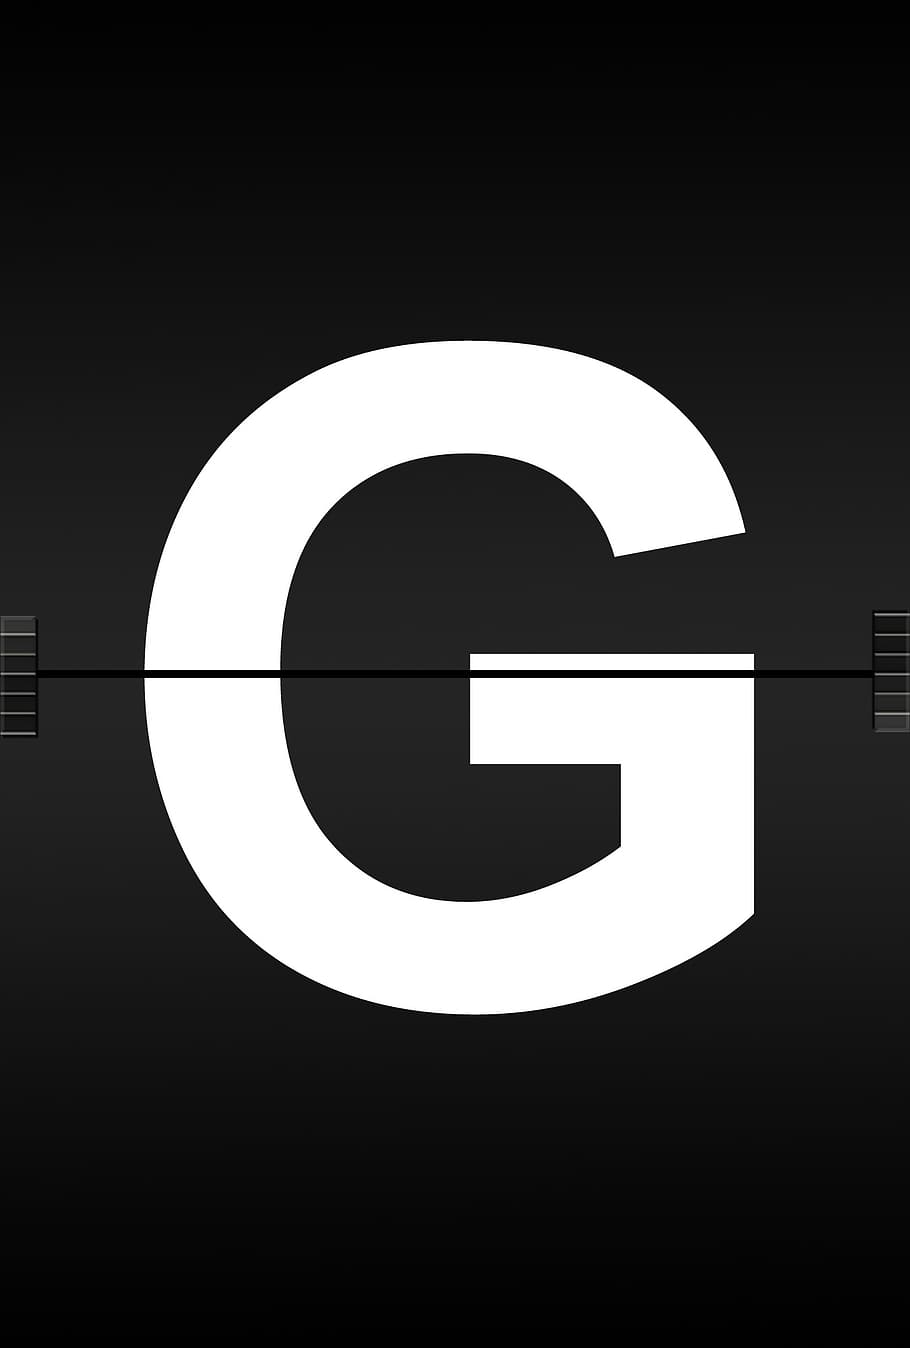 Logo Huruf G : huruf, Wallpaper:, Logo,, Letters,, Alphabet,, Journal, Font,, Airport,, Scoreboard, Wallpaper, Flare